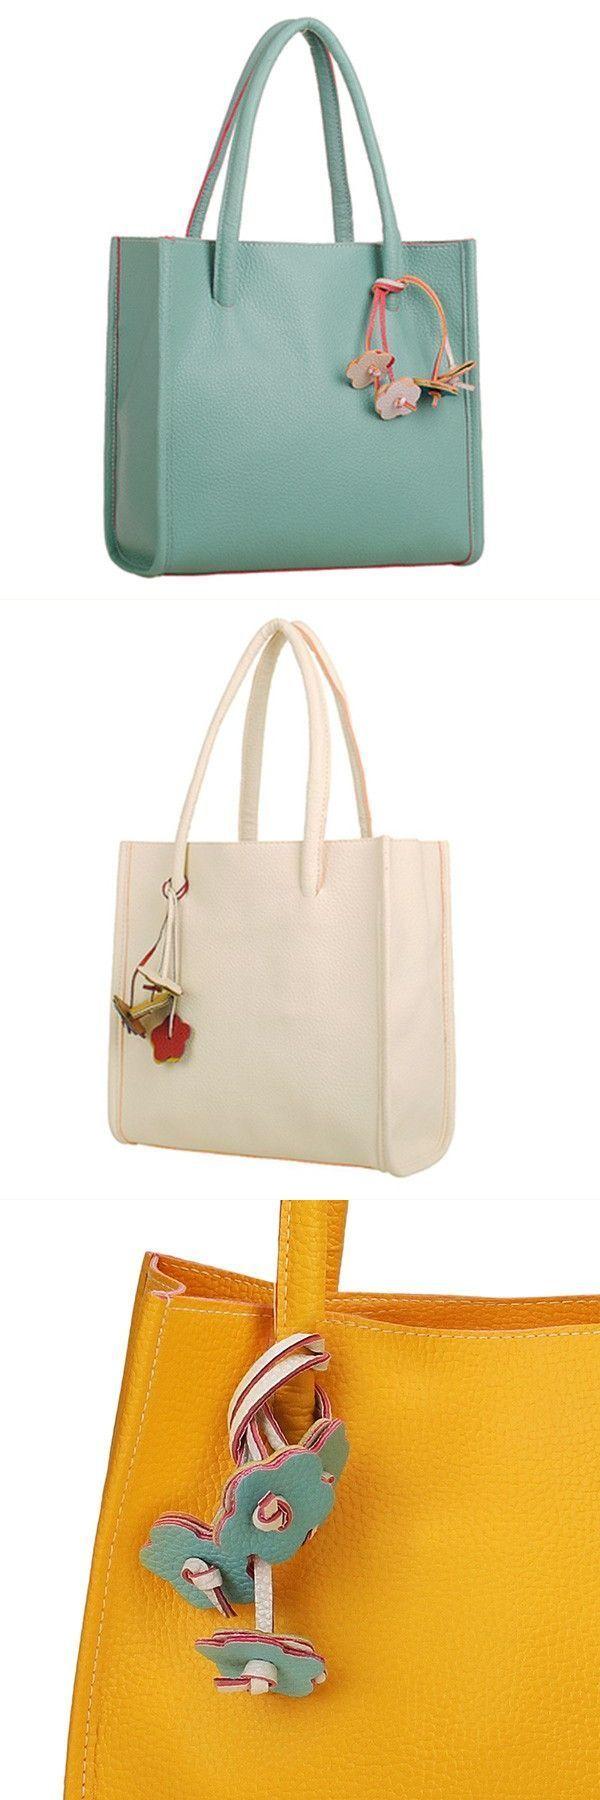 Women candy color retro commuter handbags casual shoulder bags capacity  shopping tote bags handbags chanel   0e74b38822